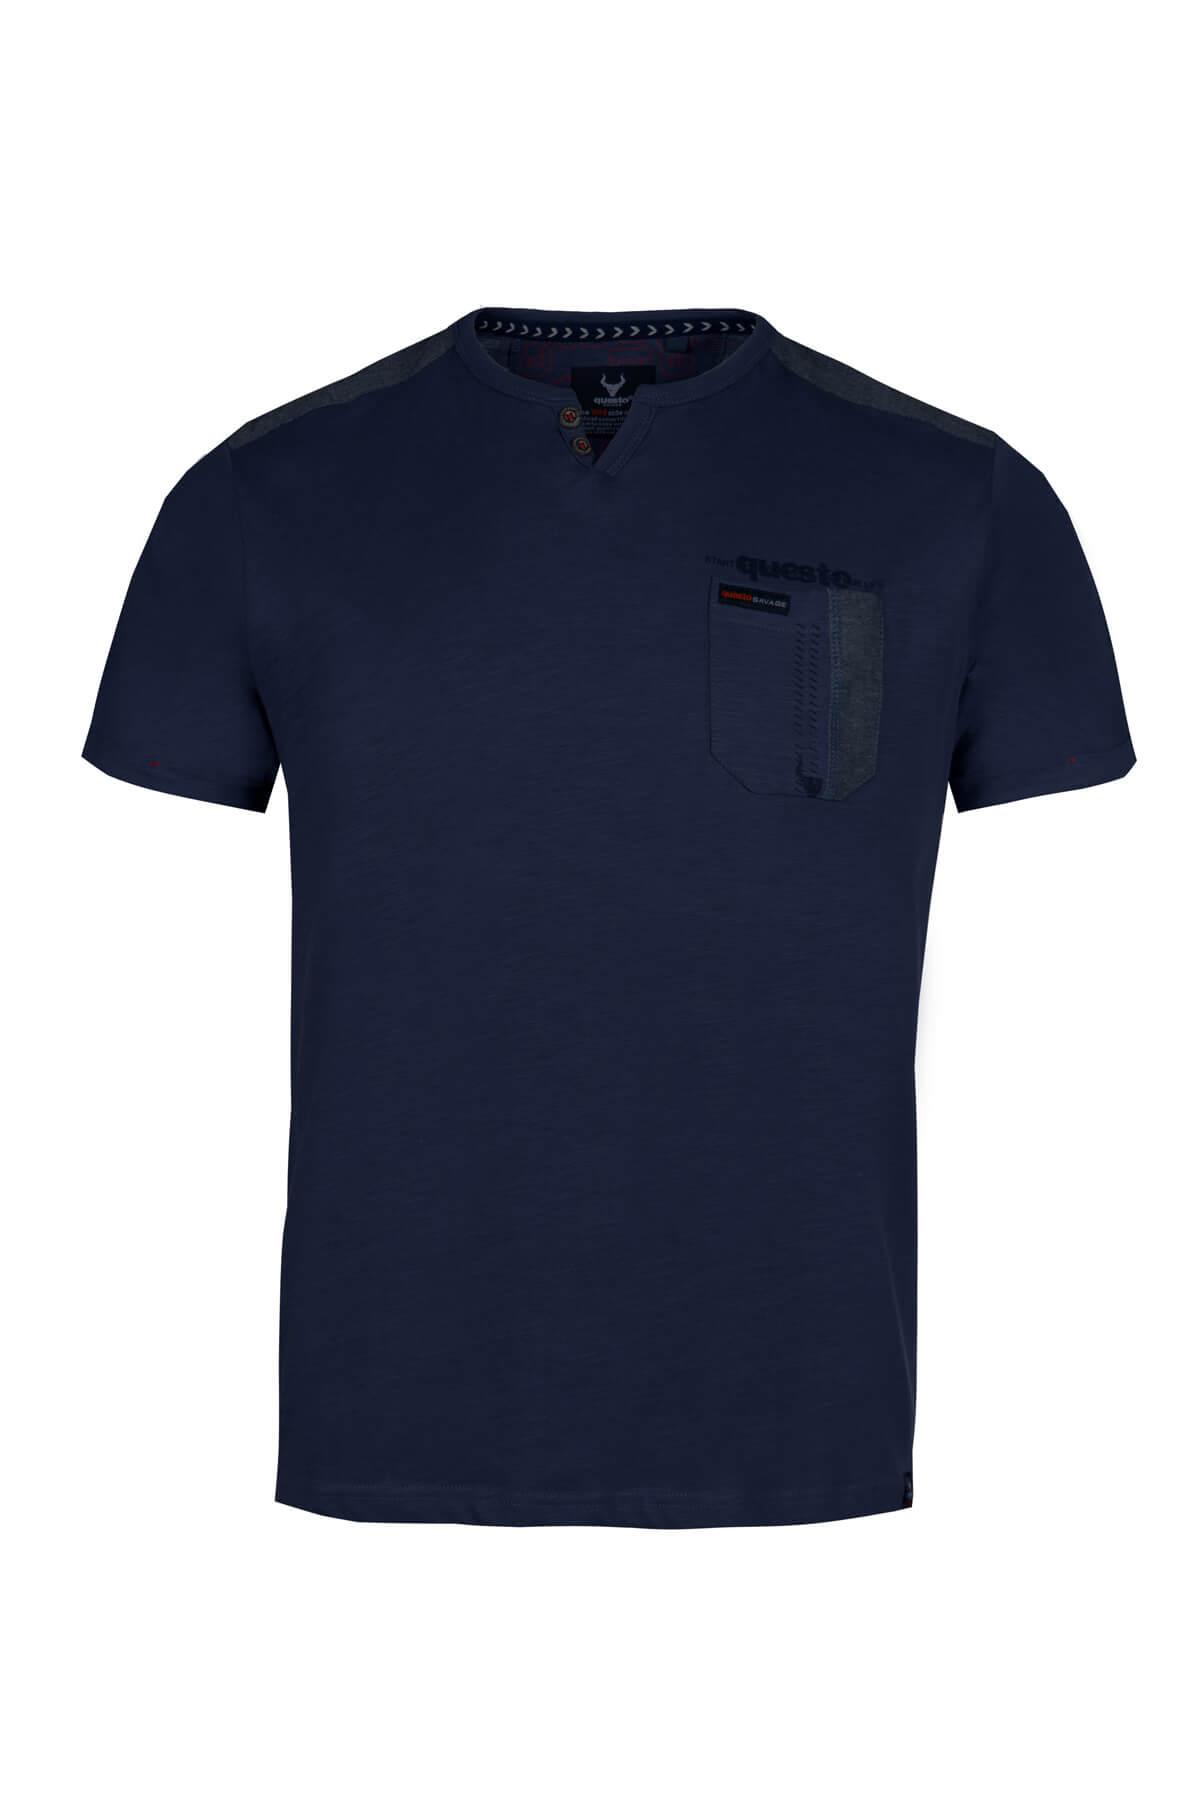 Questo Shirt Douglas